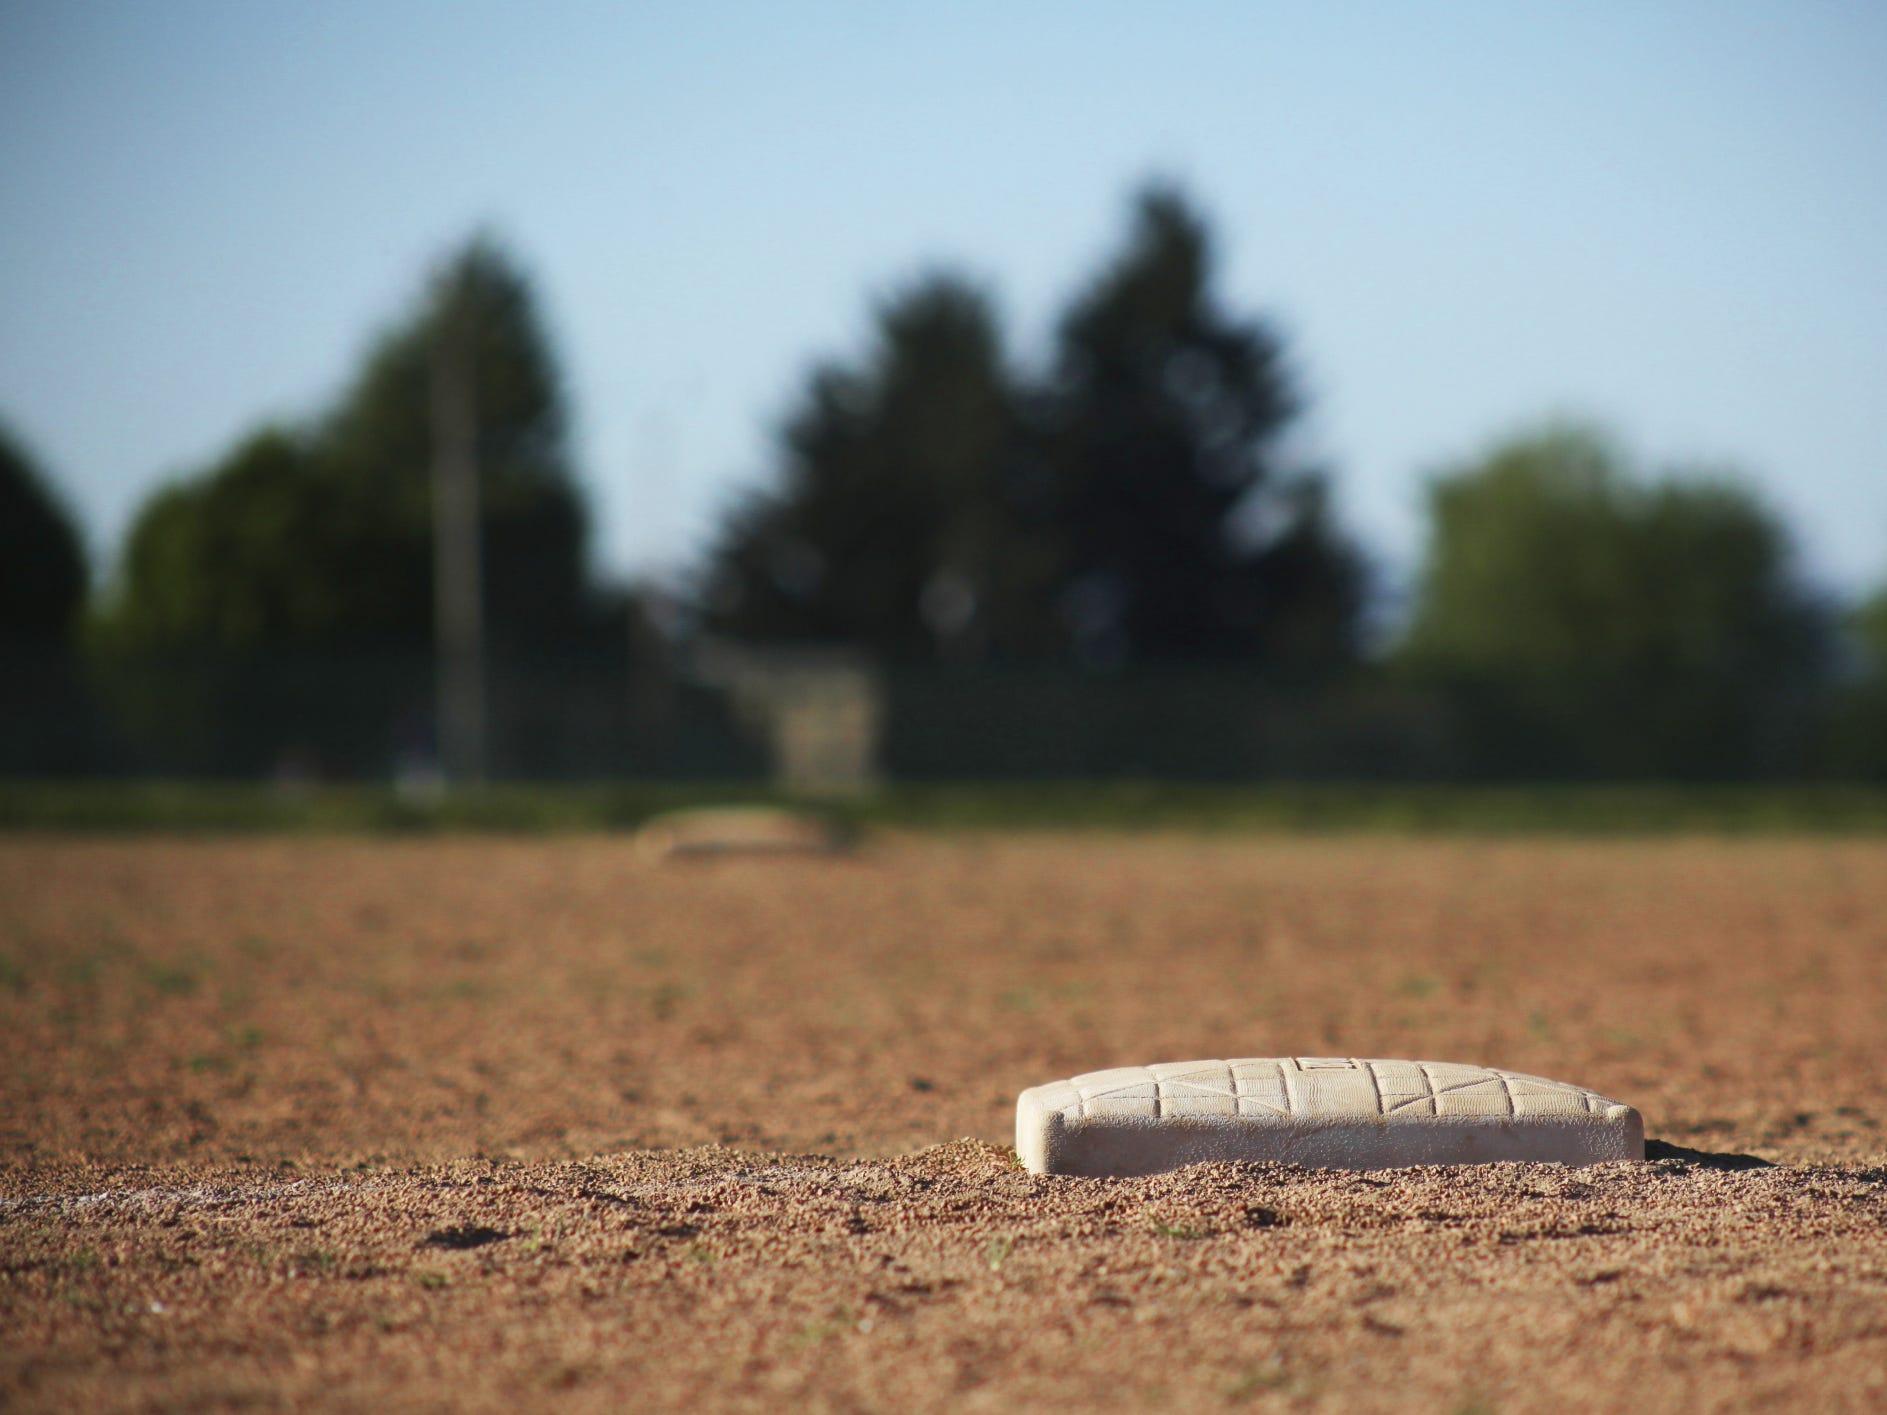 Softball Base.